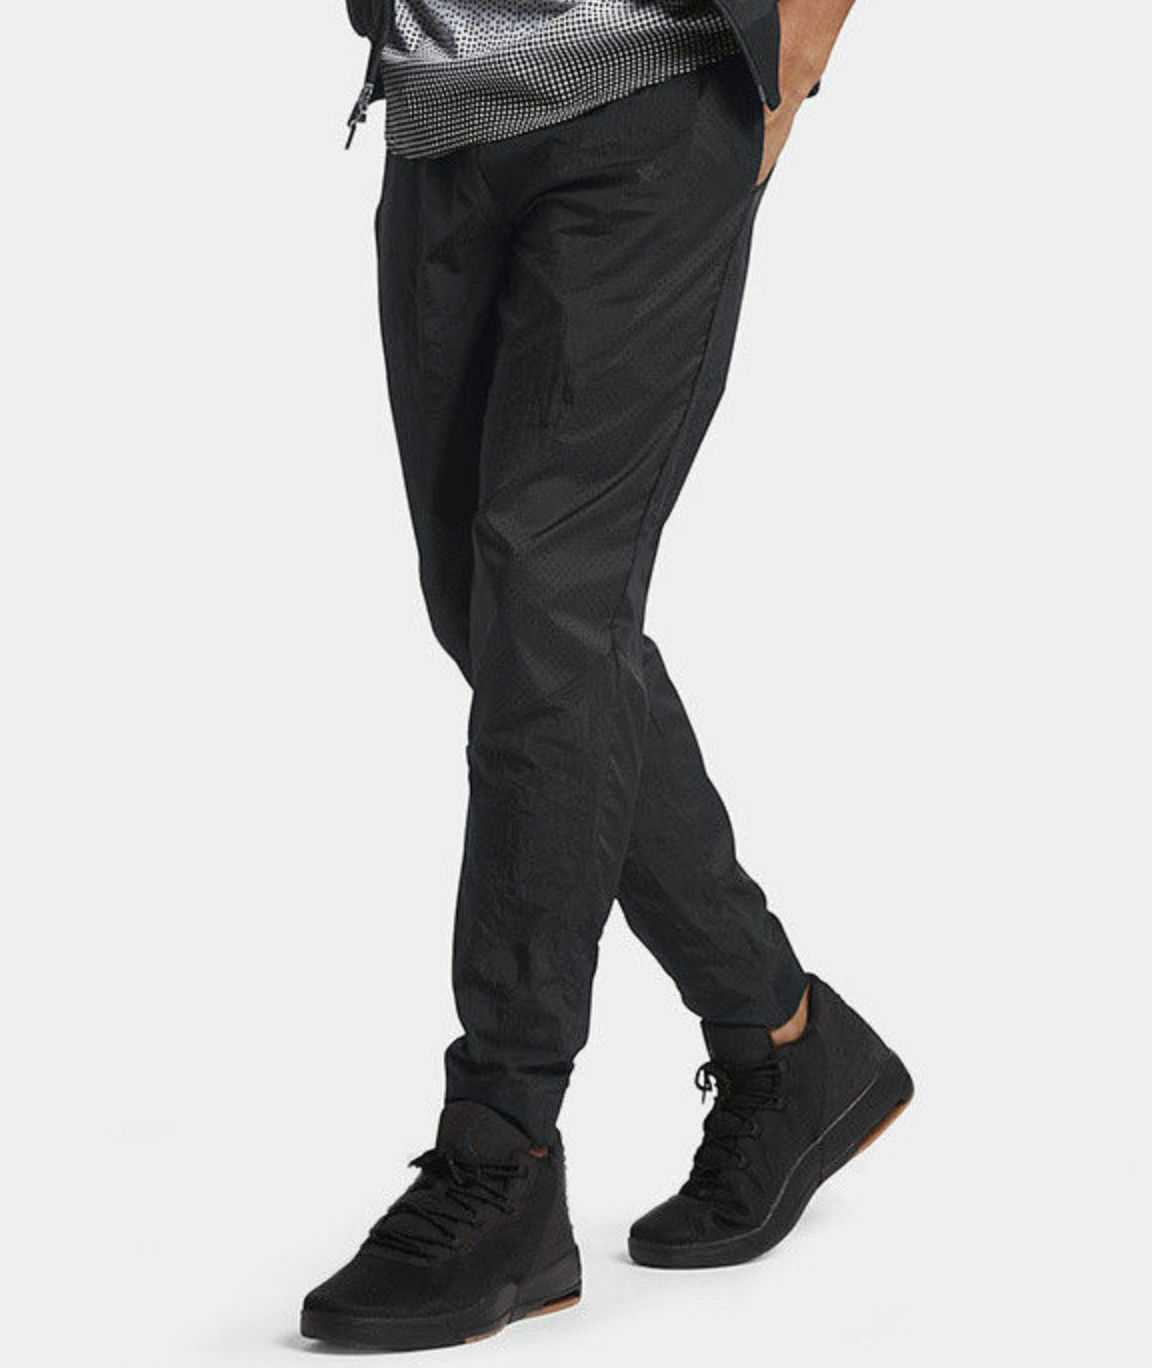 886c60fd8972 Nike Air Jordan Wings Woven Athletic Pants Tapered Black Mens Size ...